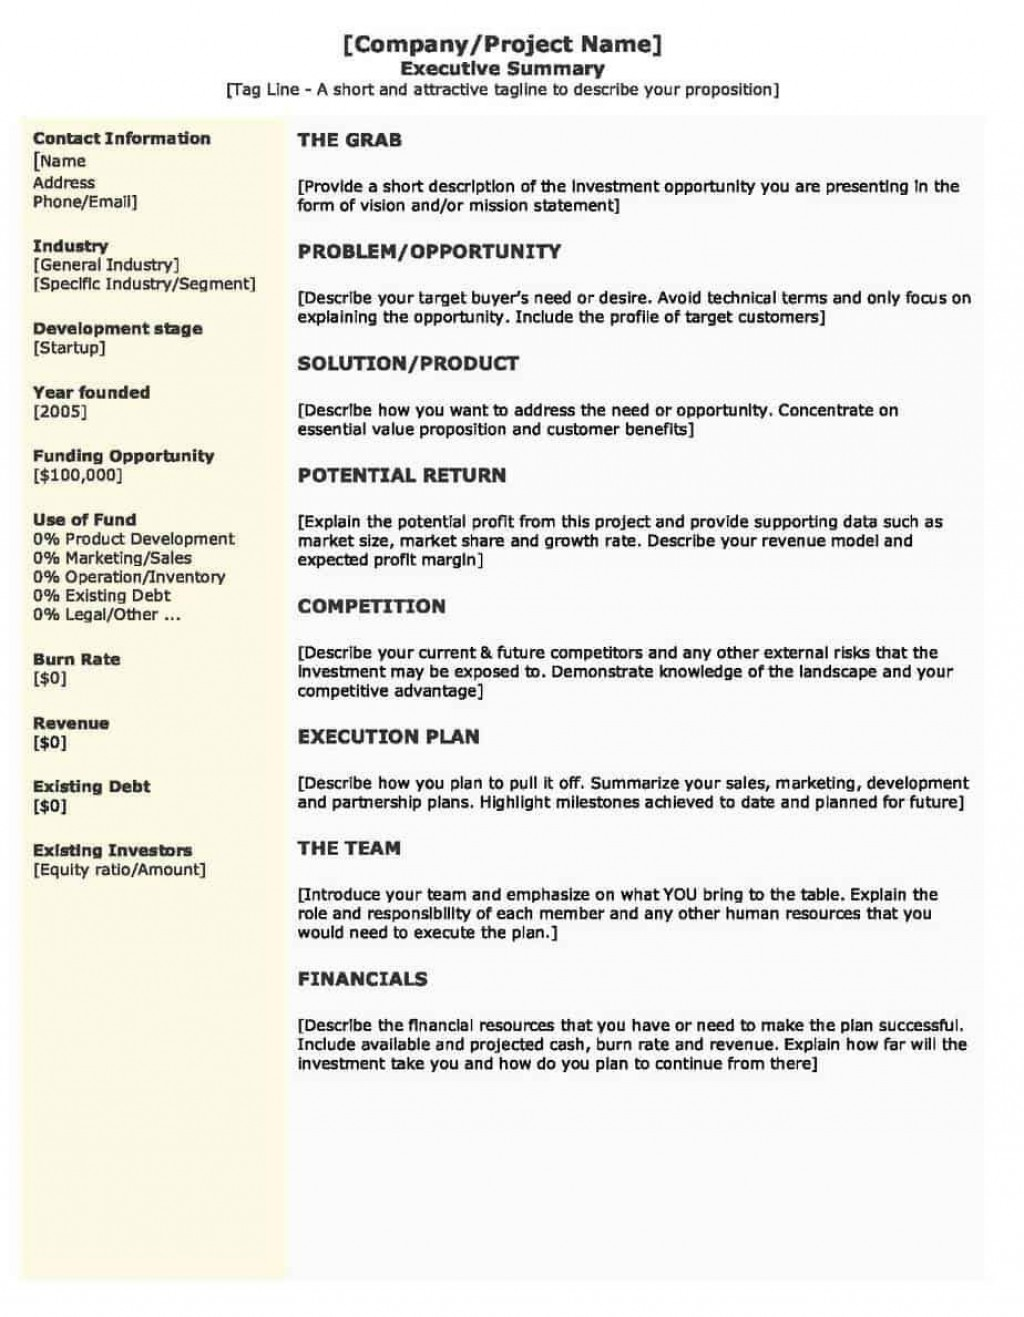 001 Imposing Executive Summary Template Word Free Photo Large